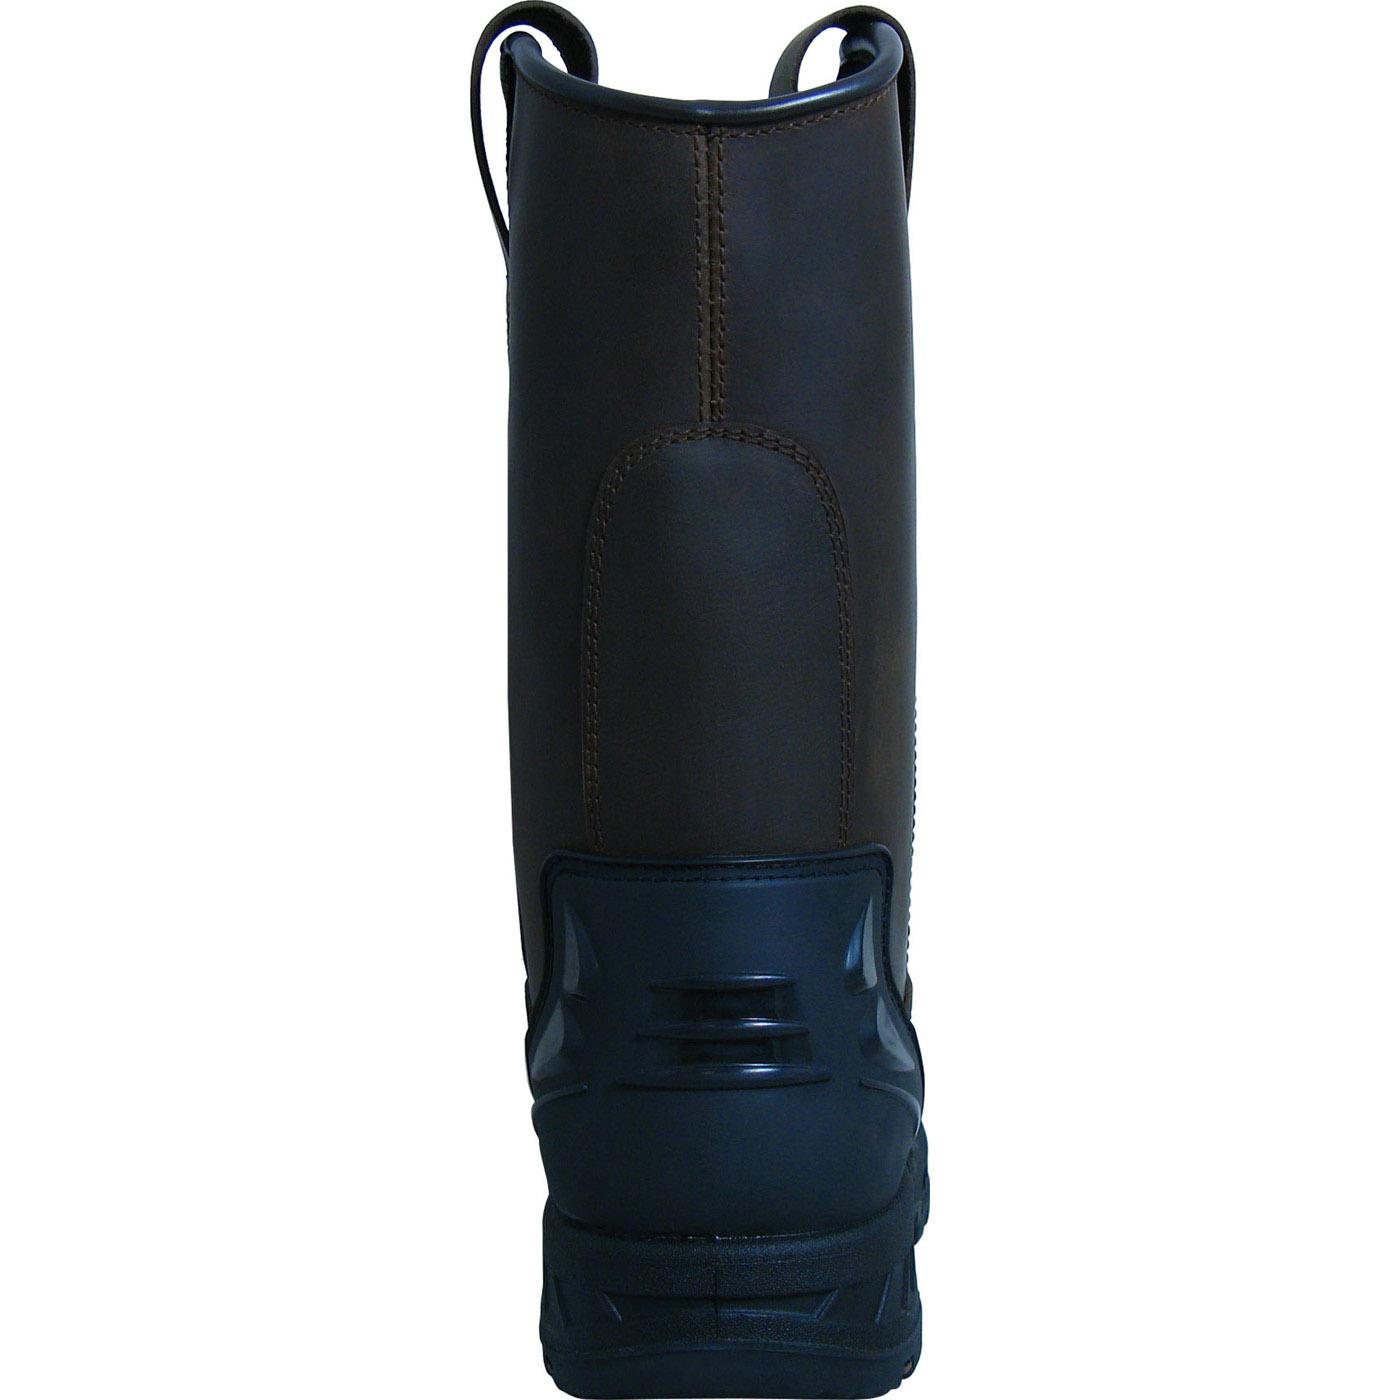 89a69782b00 S Fellas by Genuine Grip Men's 6400 Composite Toe Puncture Resistant  Waterproof Wellington Work Boots